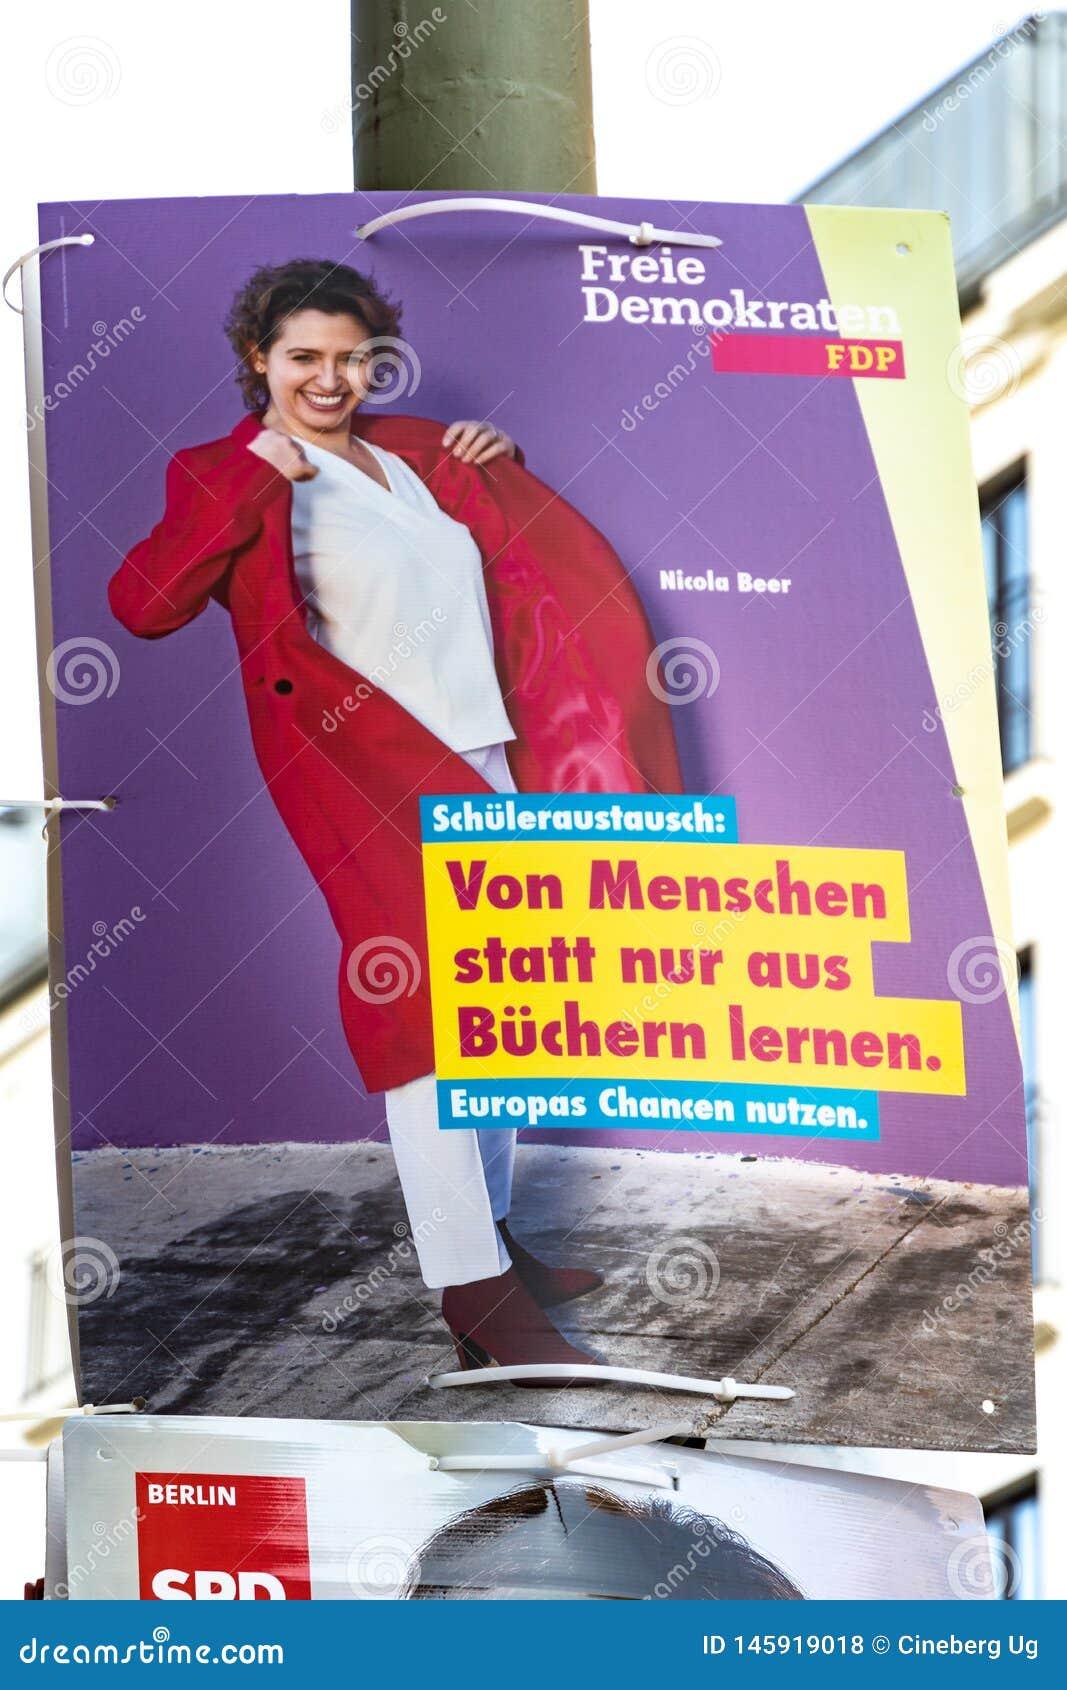 FDP-politisk kampanjaffisch